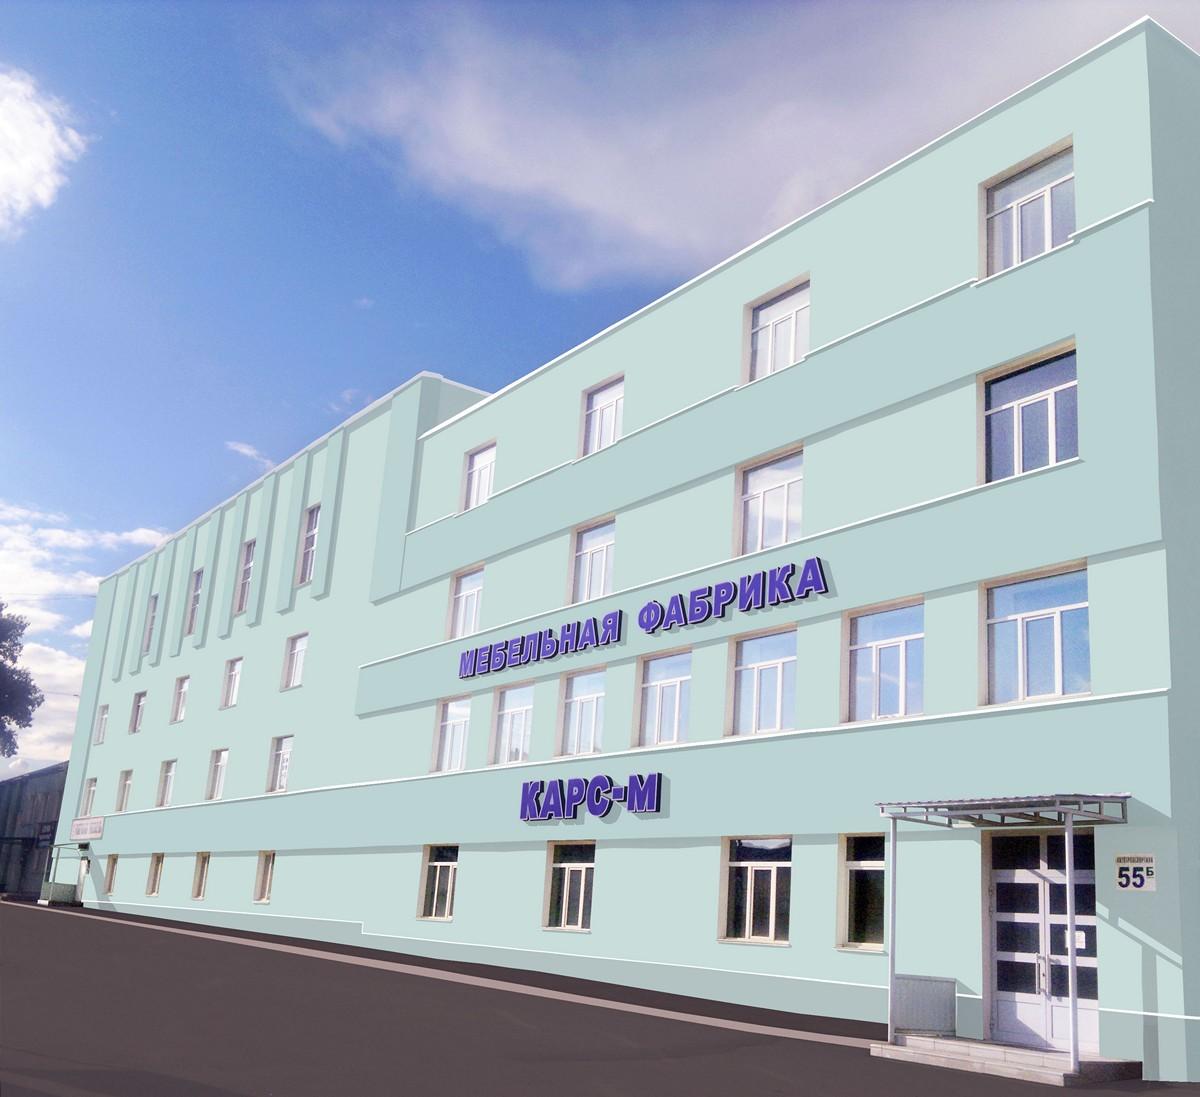 Карс-М мебельная фабрика. Барнаул